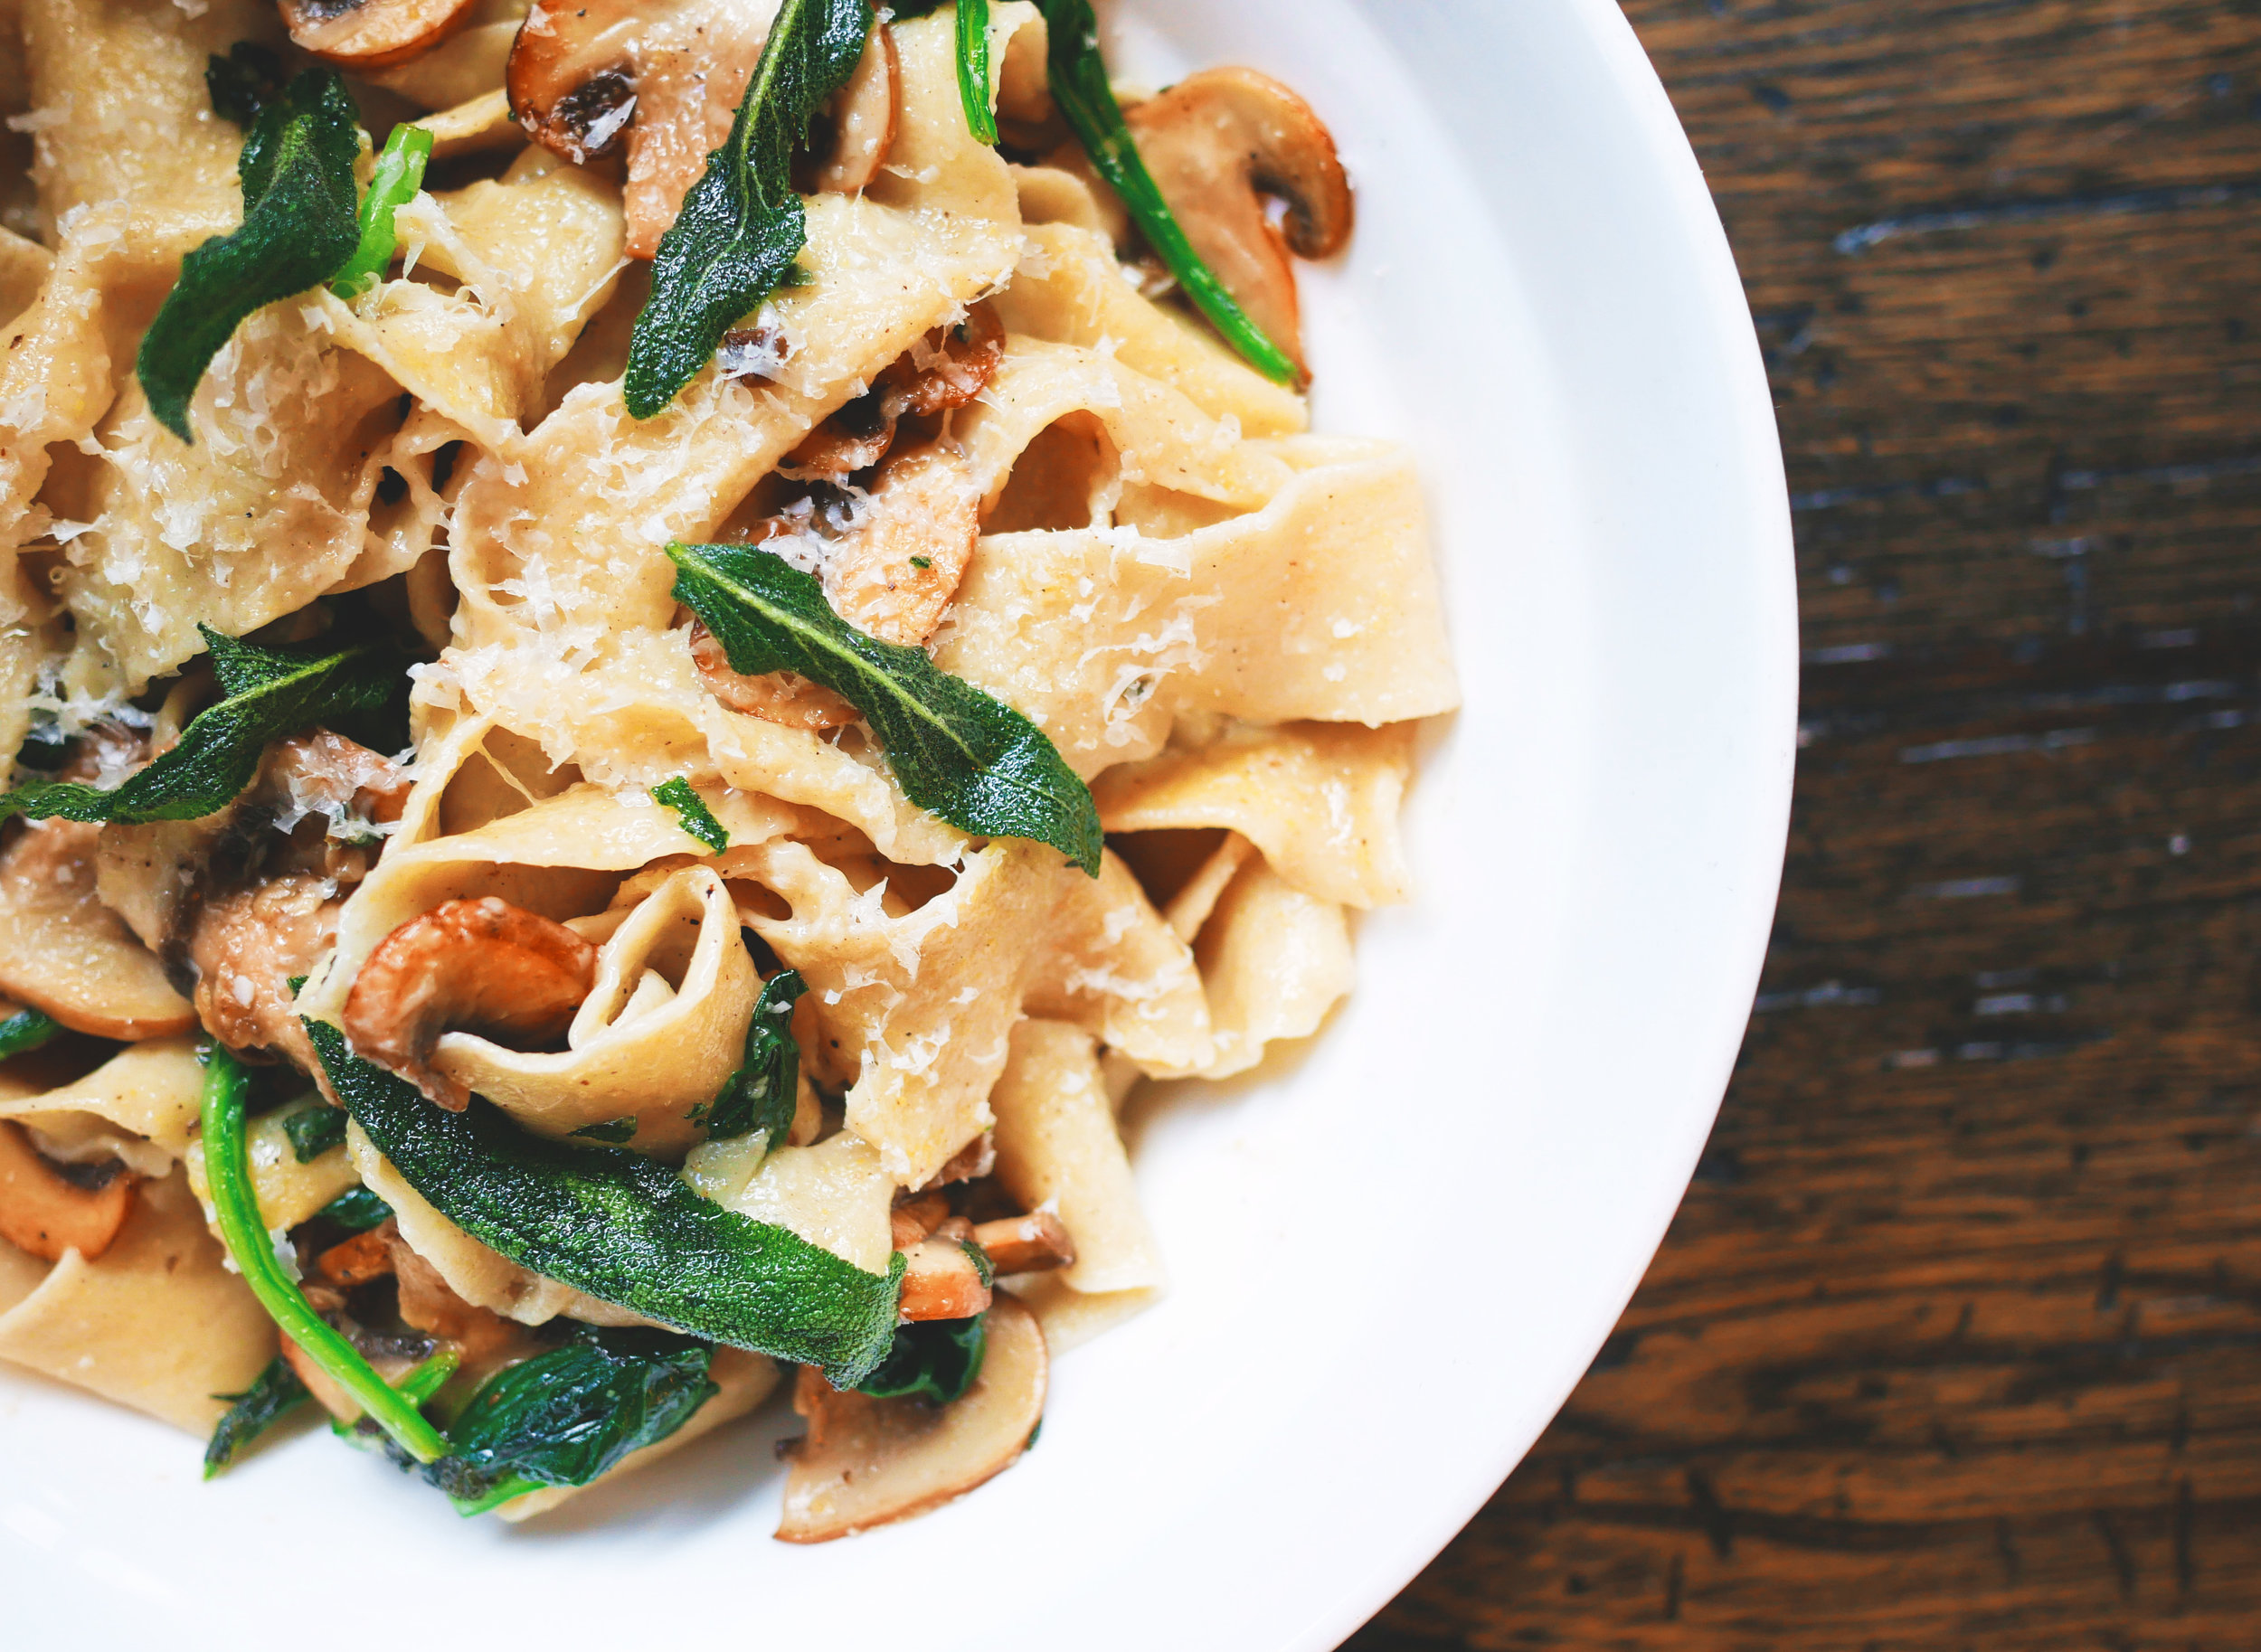 How to precook pasta